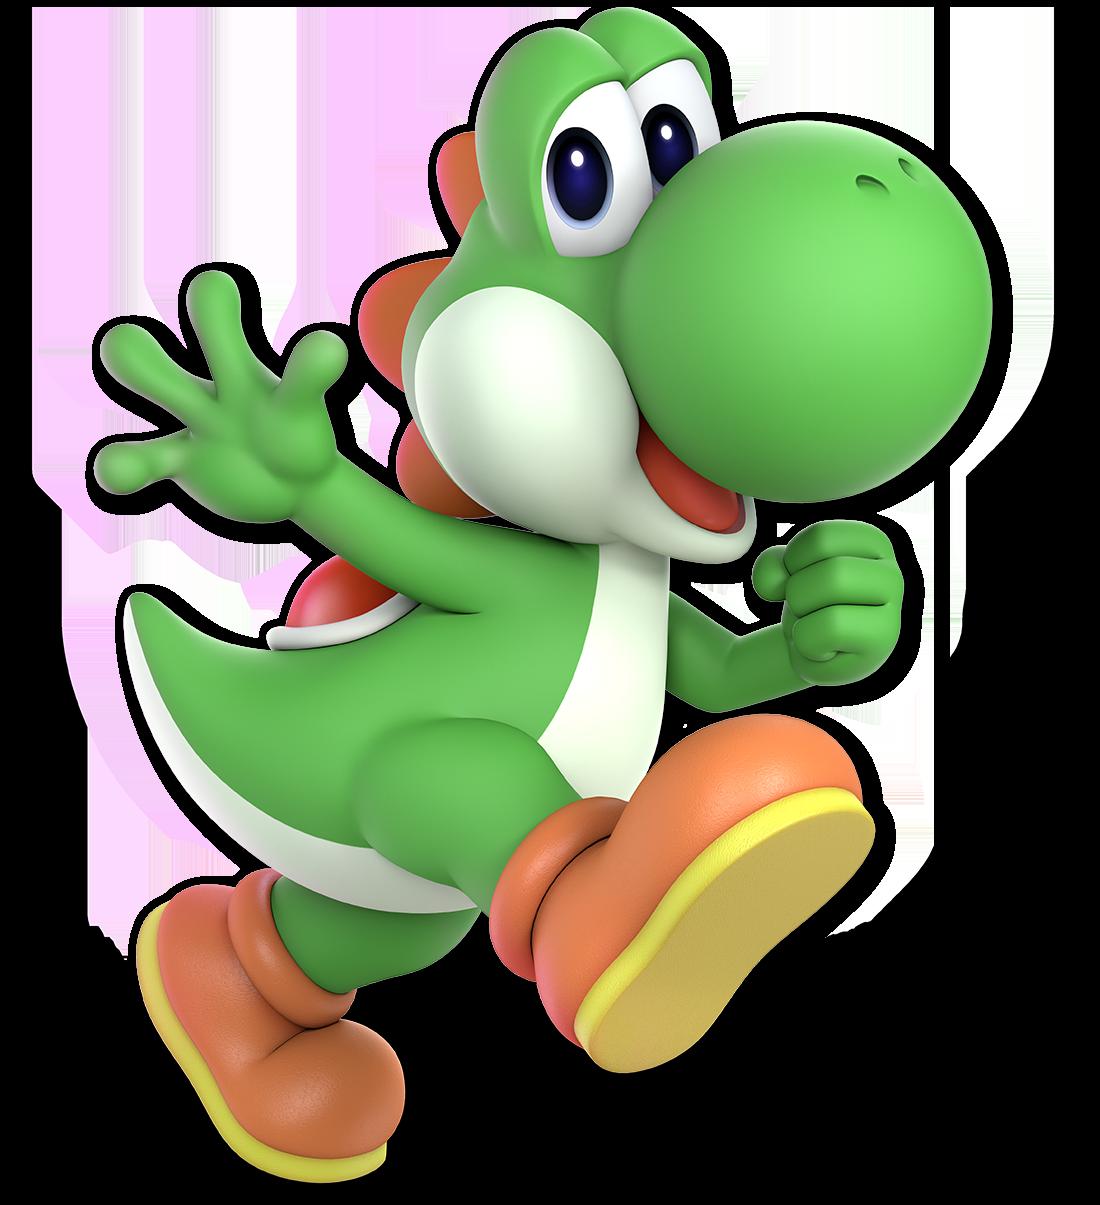 Yoshi | Heroes Wiki | Fandom